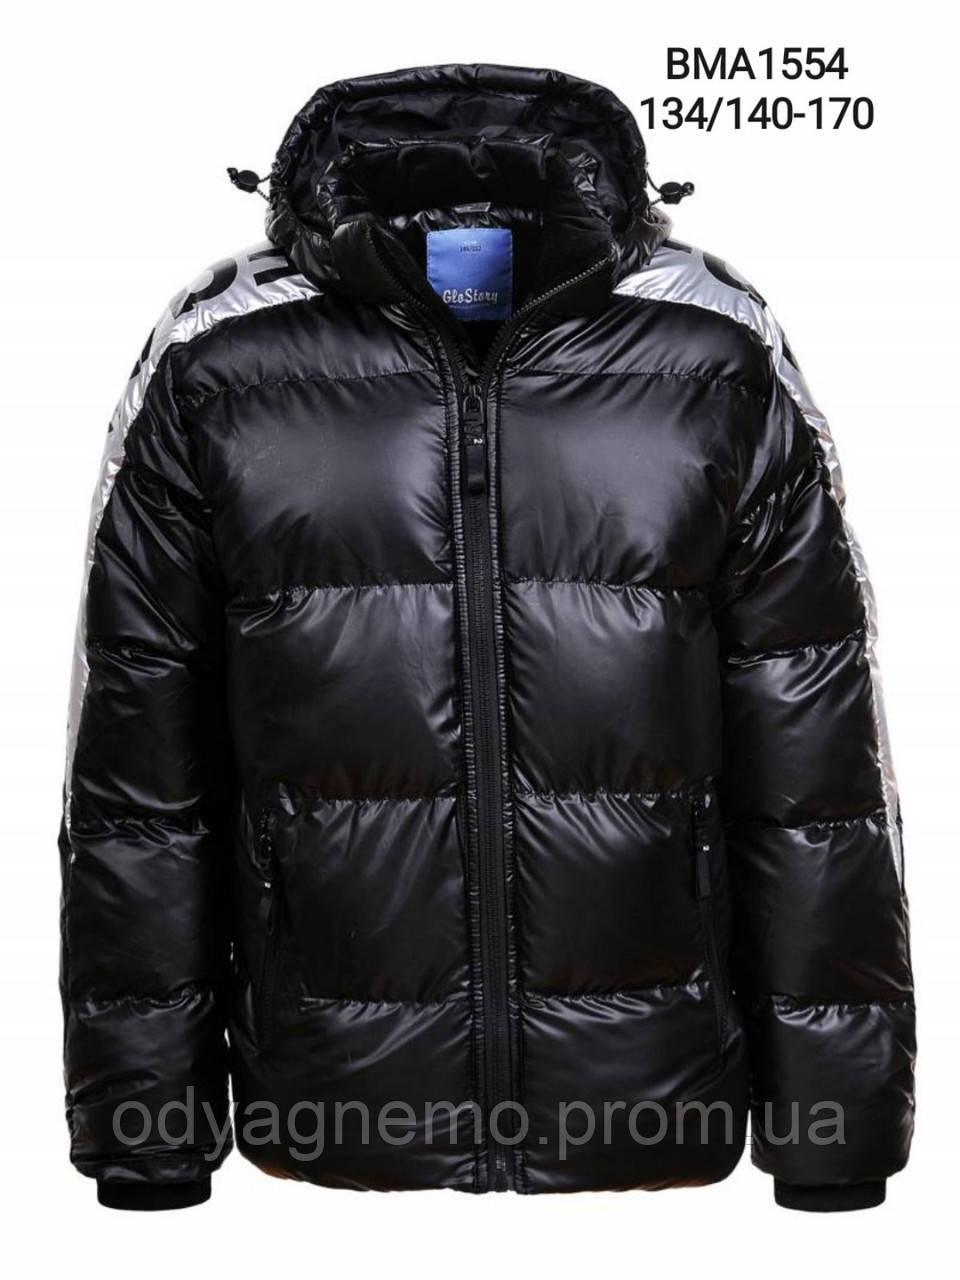 Куртка утепленная для мальчиков Glo-Story, 134/140-170 рр. Артикул: BMA1554